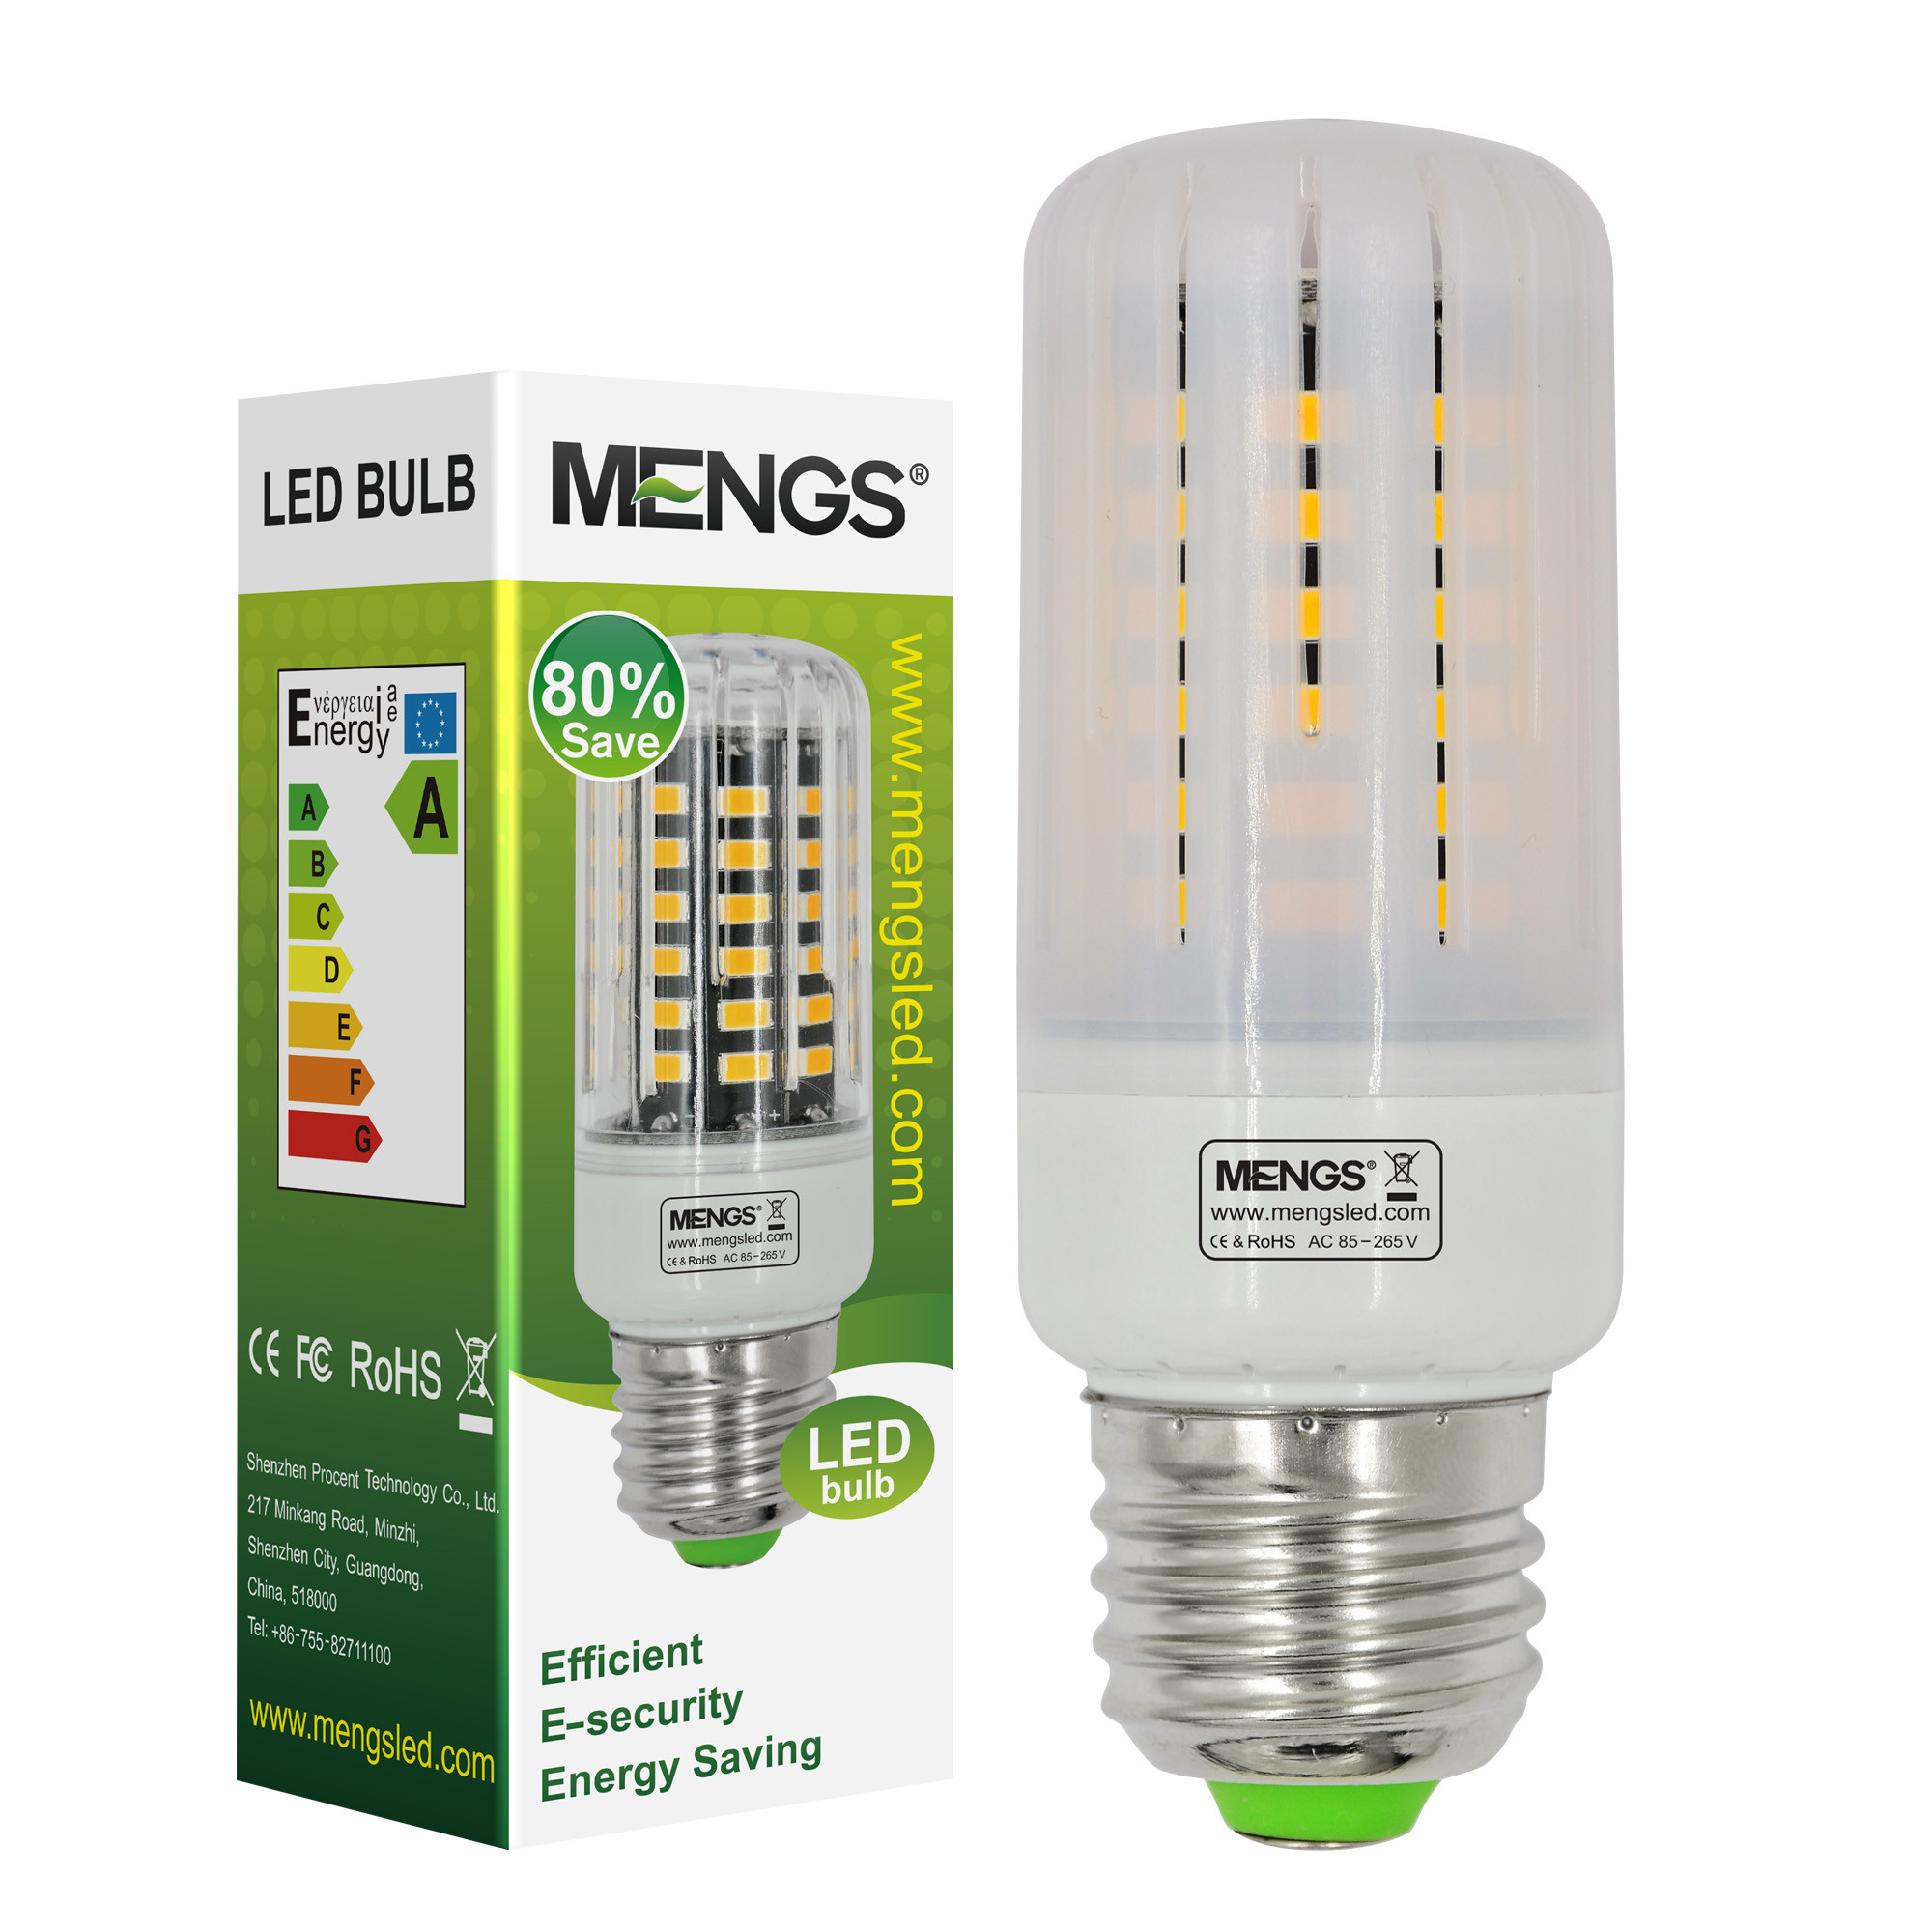 MENGS® Anti-Strobe E27 7W LED Corn Light 56x 5736 SMD LB LED Bulb Lamp In Cool White Energy-Saving Lamp